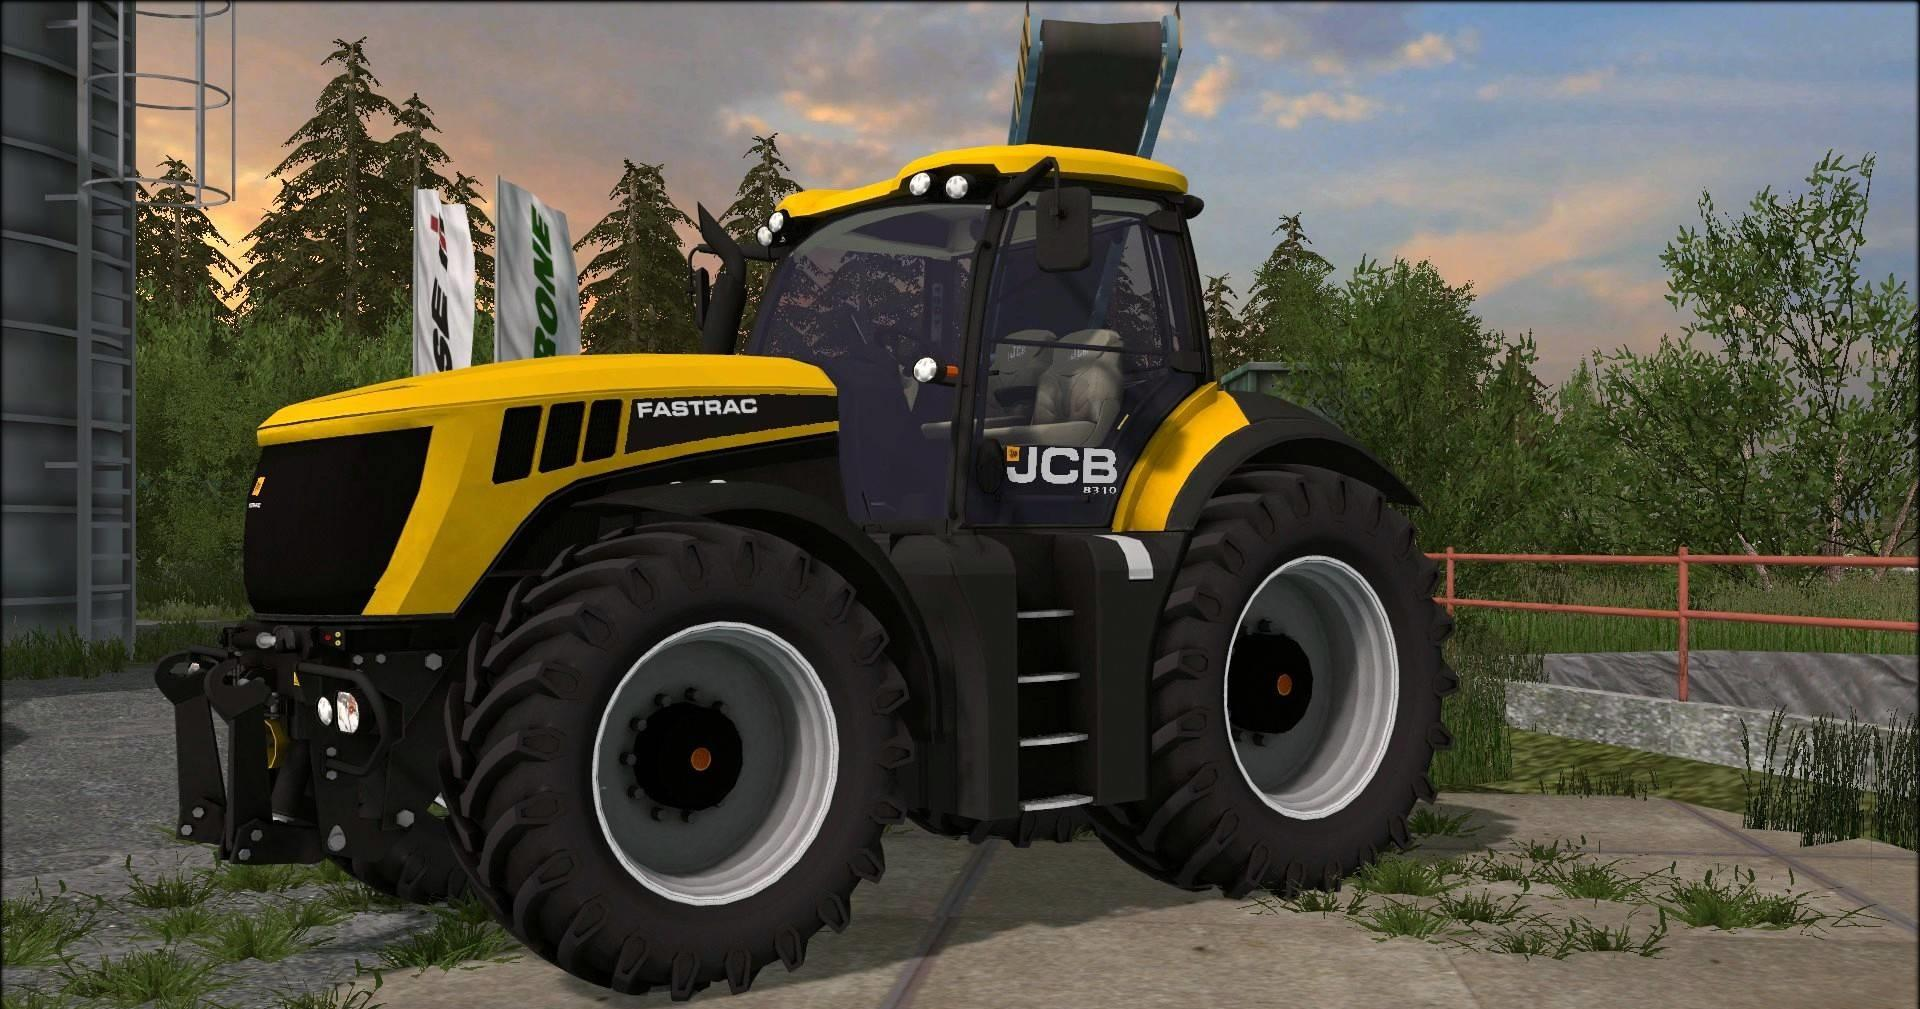 jcb-fastrac-8310-v4-2_1